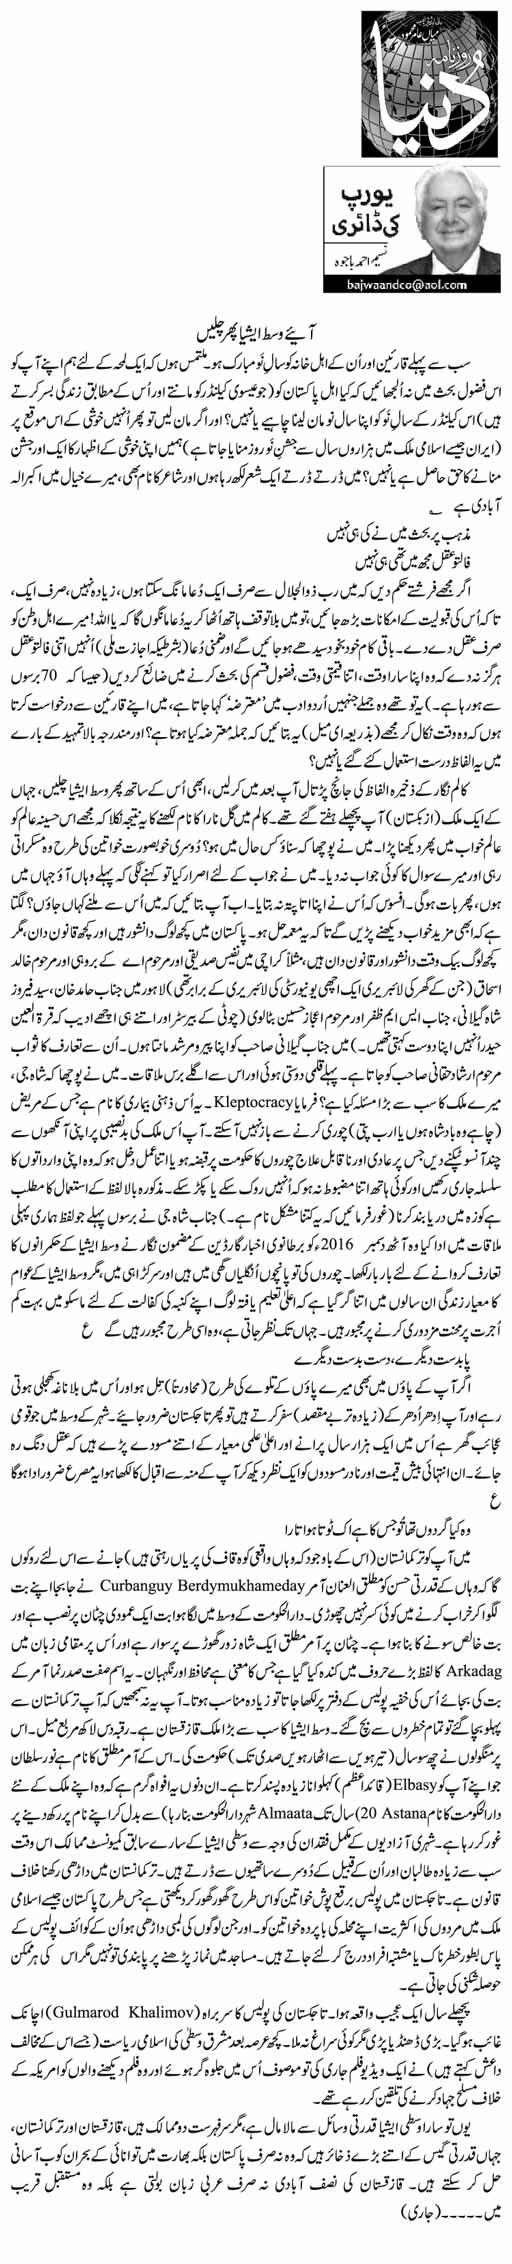 Aayiye Wast Asia Phir Chalein | Naseem Ahmad Bajwa | Daily Urdu Columns